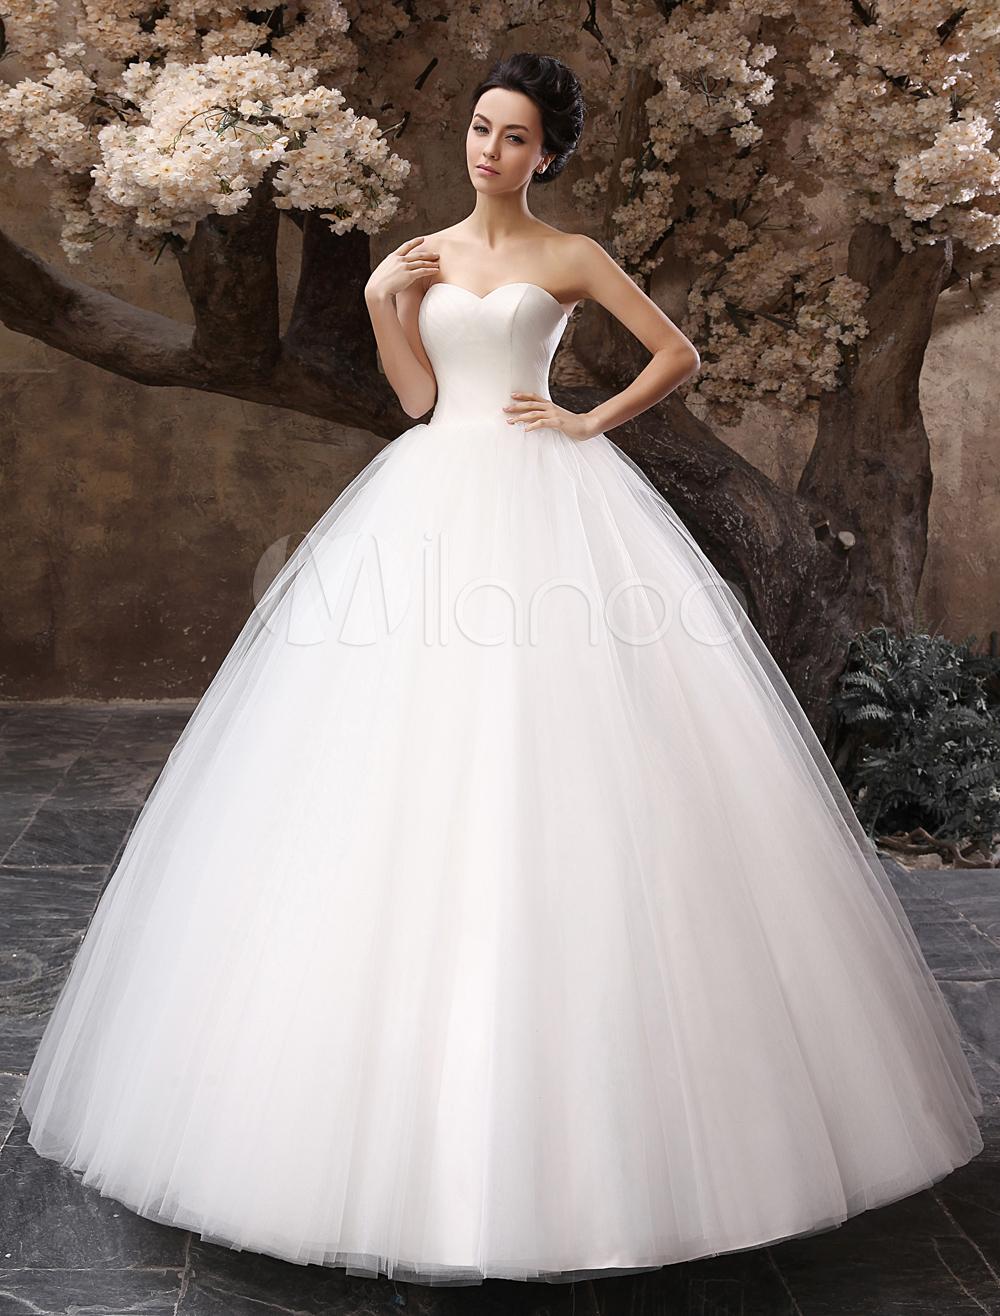 Ball gowns wedding dresses  Robe mariage en tulle blanc plissé longueur plancher  Wedding